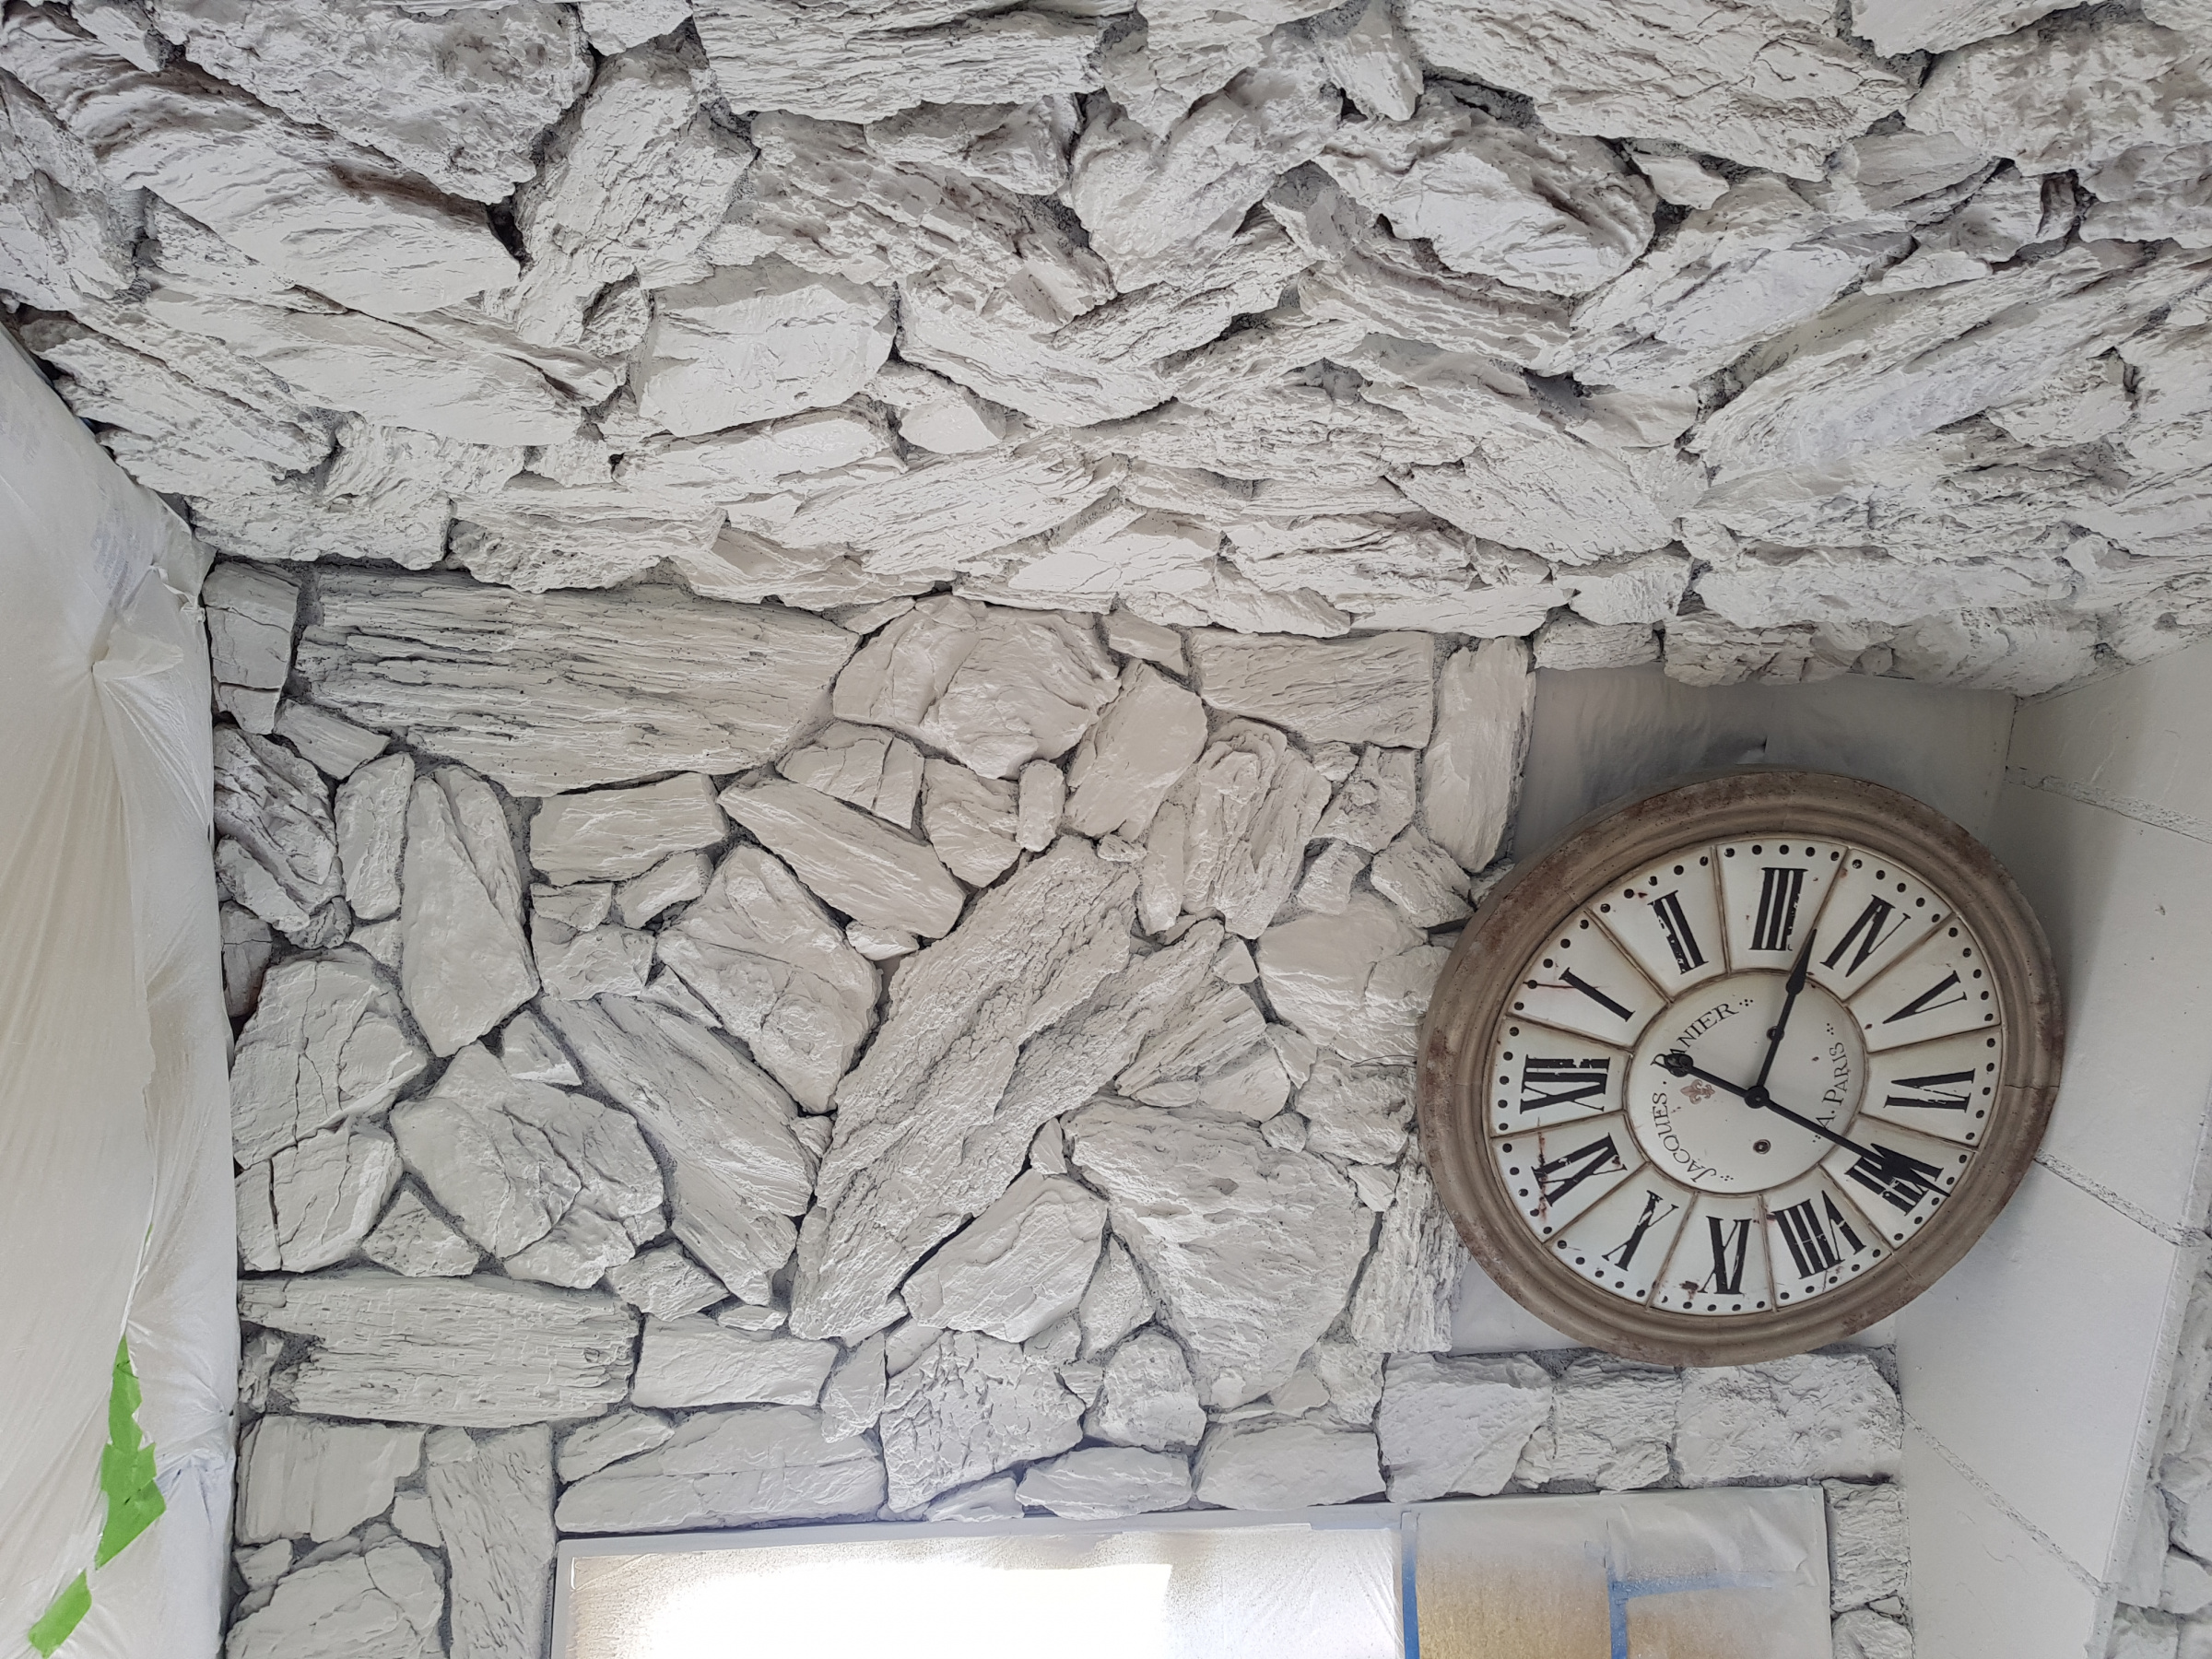 Painting interior lava rock wall-20190419_101454.jpg